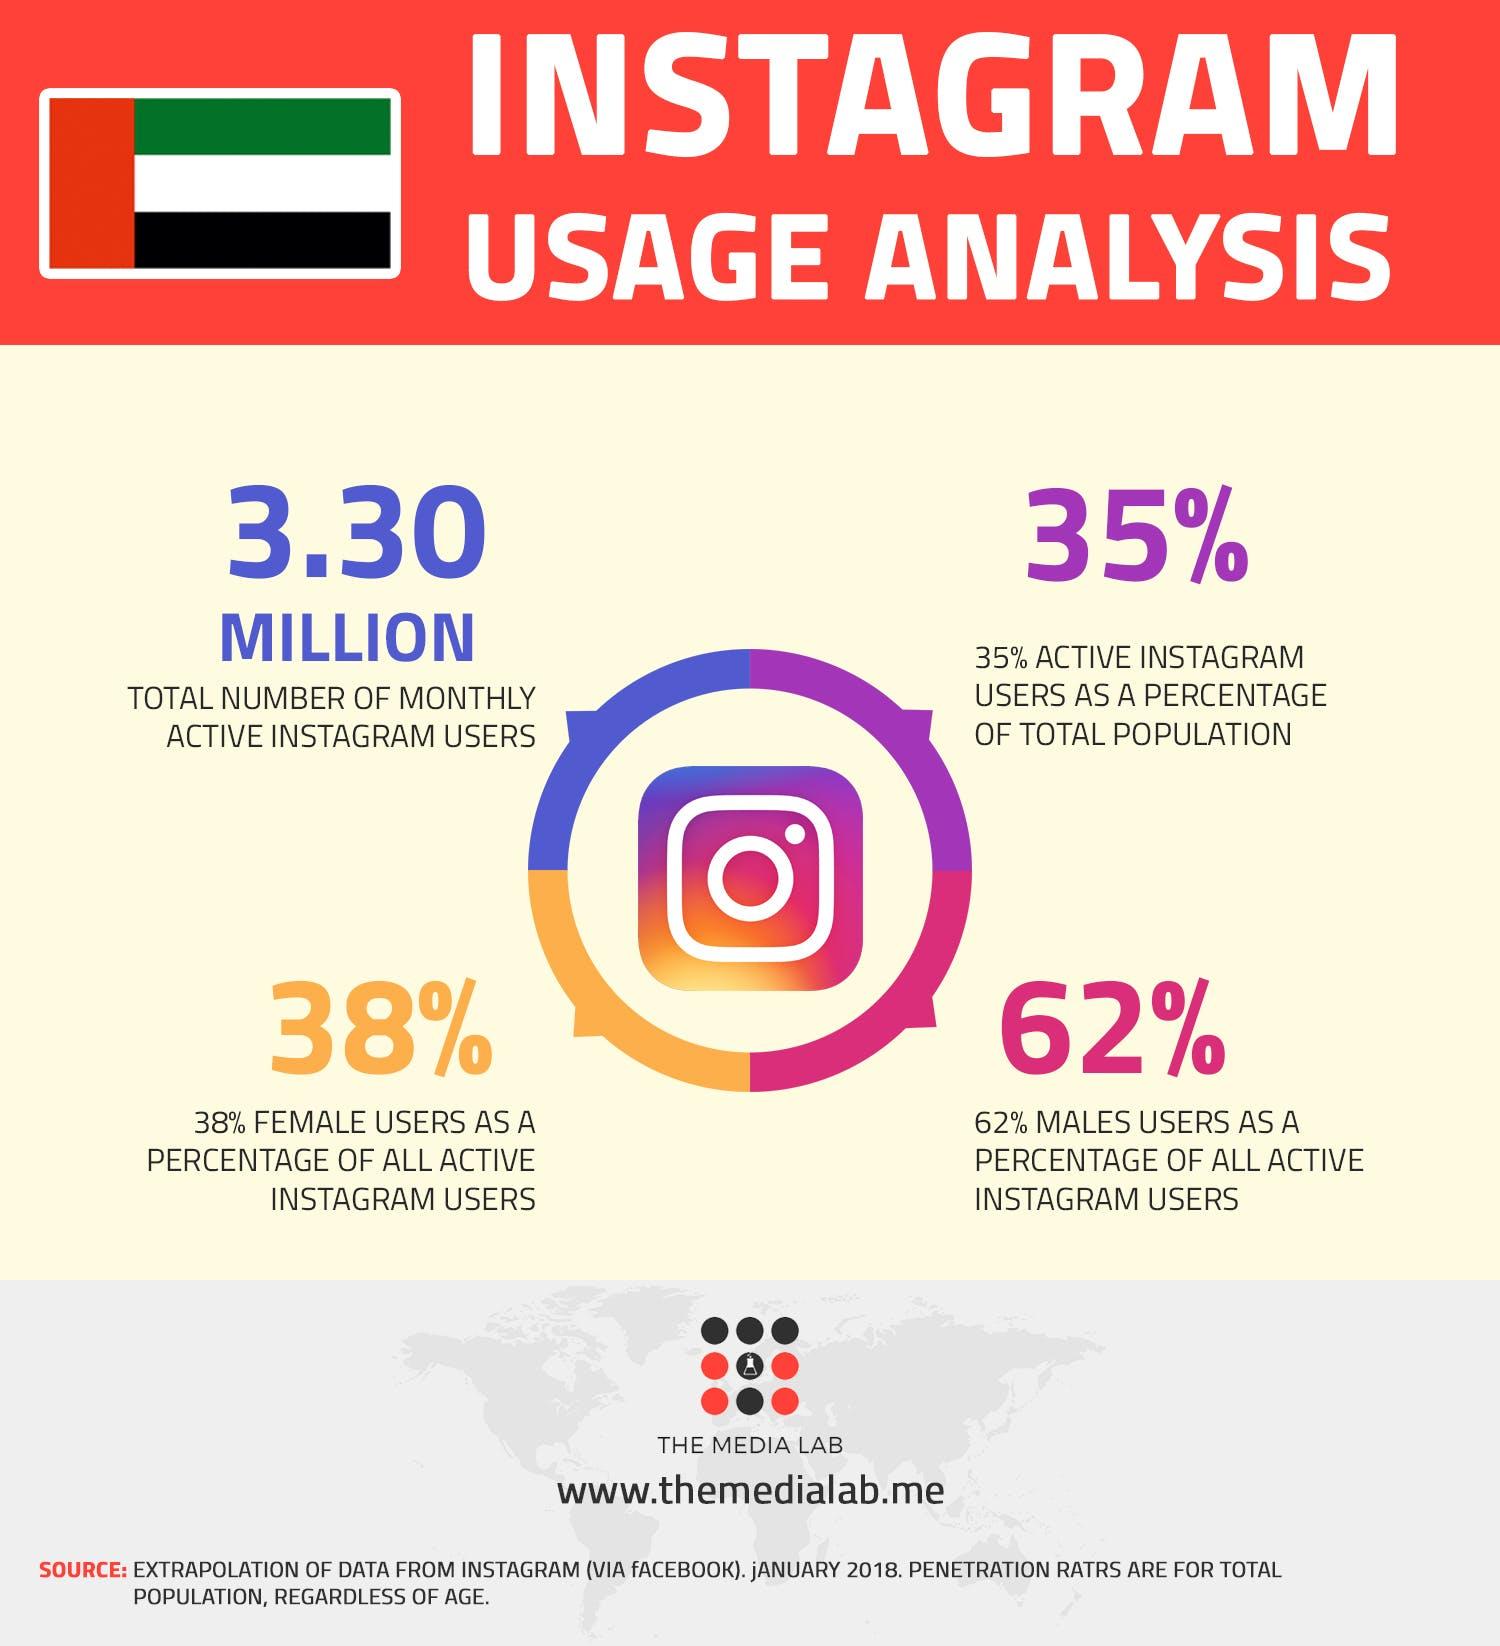 Instagram usage analysis in UAE 2018